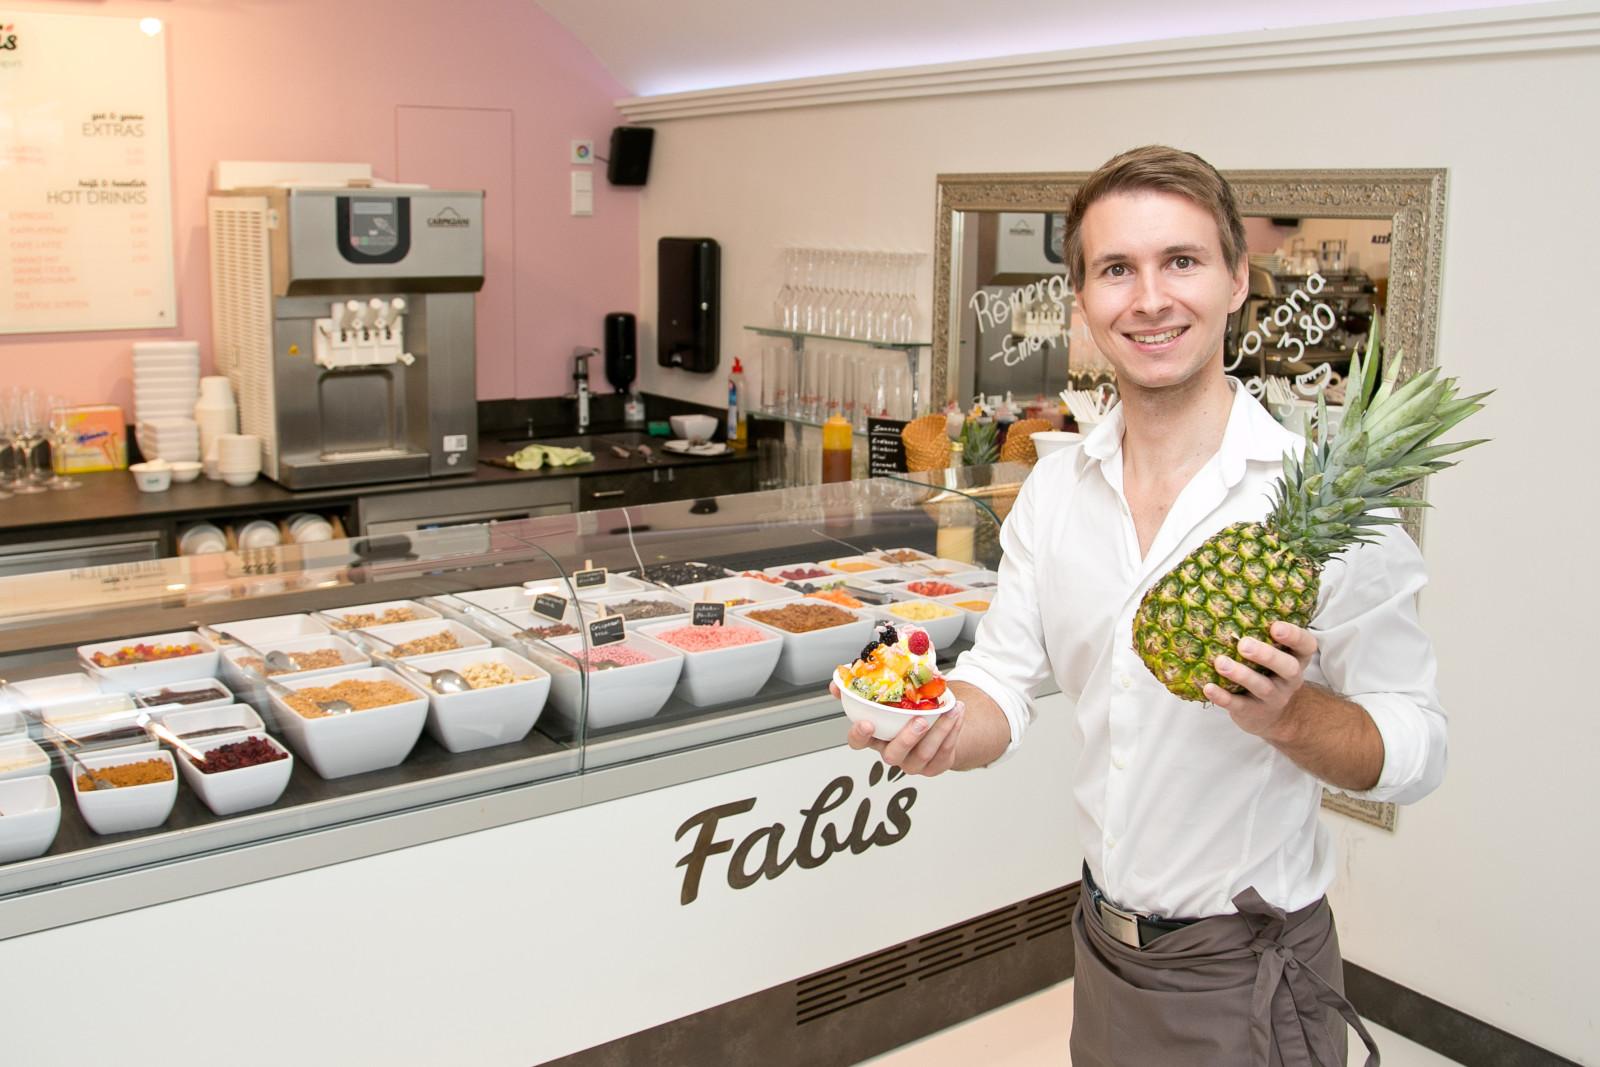 Fabian Sturm, Fabis Frozen Bio Yogurt Salzburg, 20150824 Foto: wildbild, Herbert Rohrer